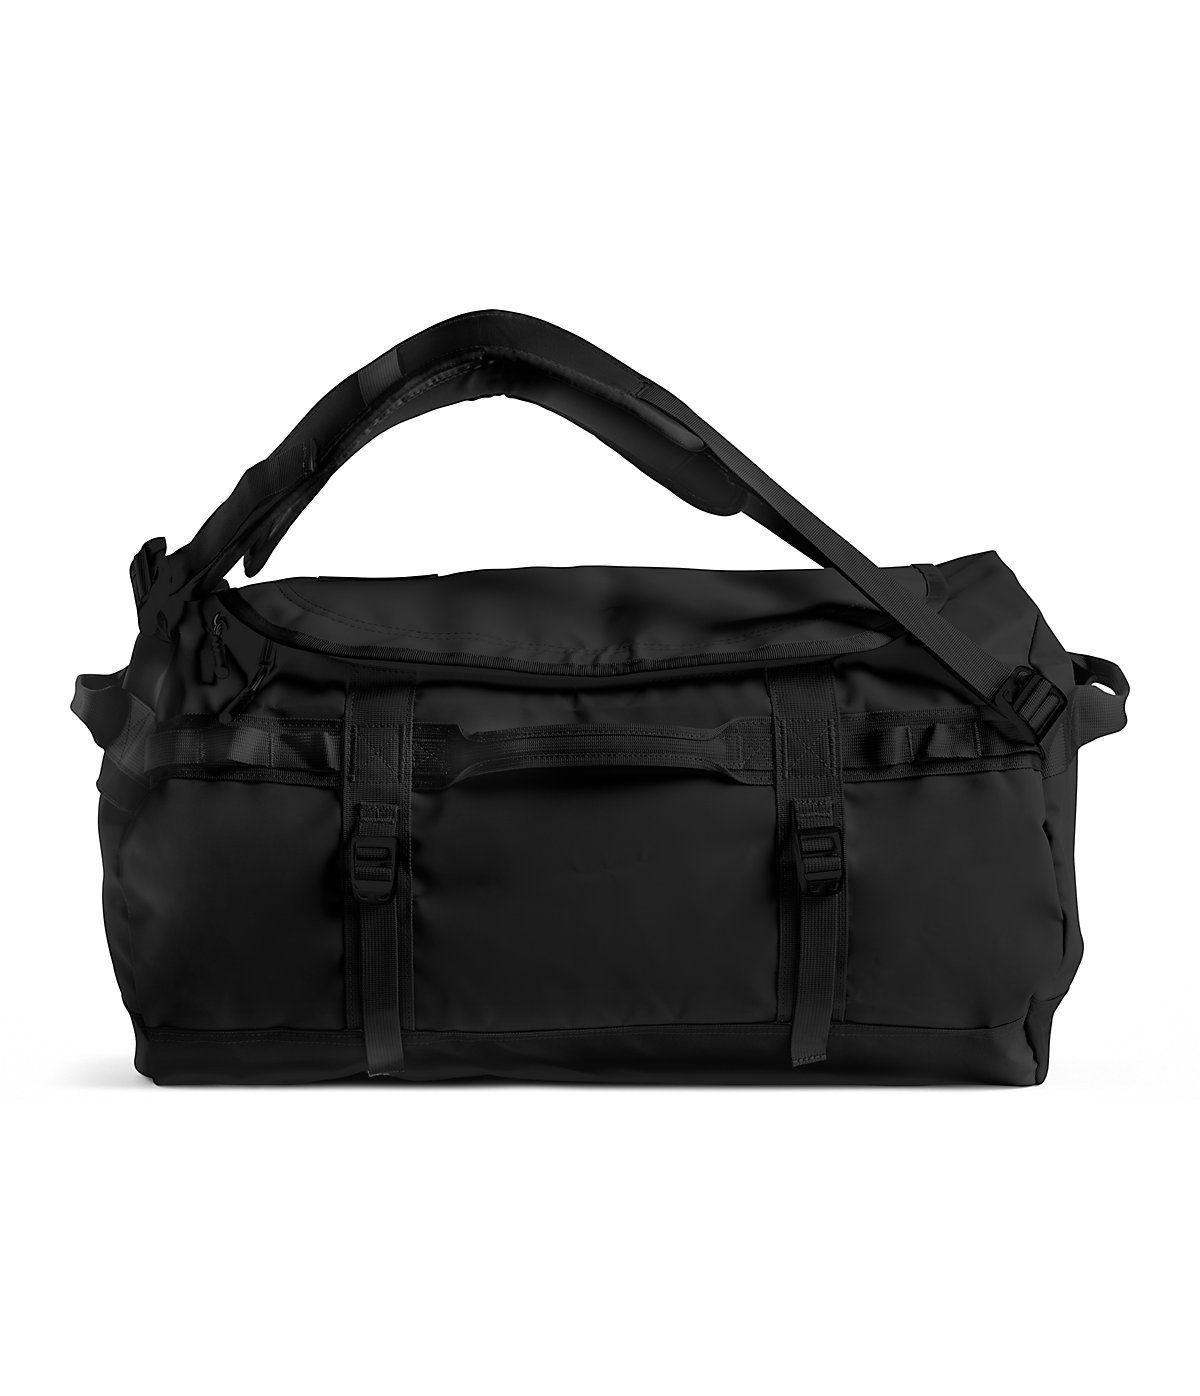 10772a4715c2 Base camp duffel—s updated design in 2019 | Products | Duffel bag ...